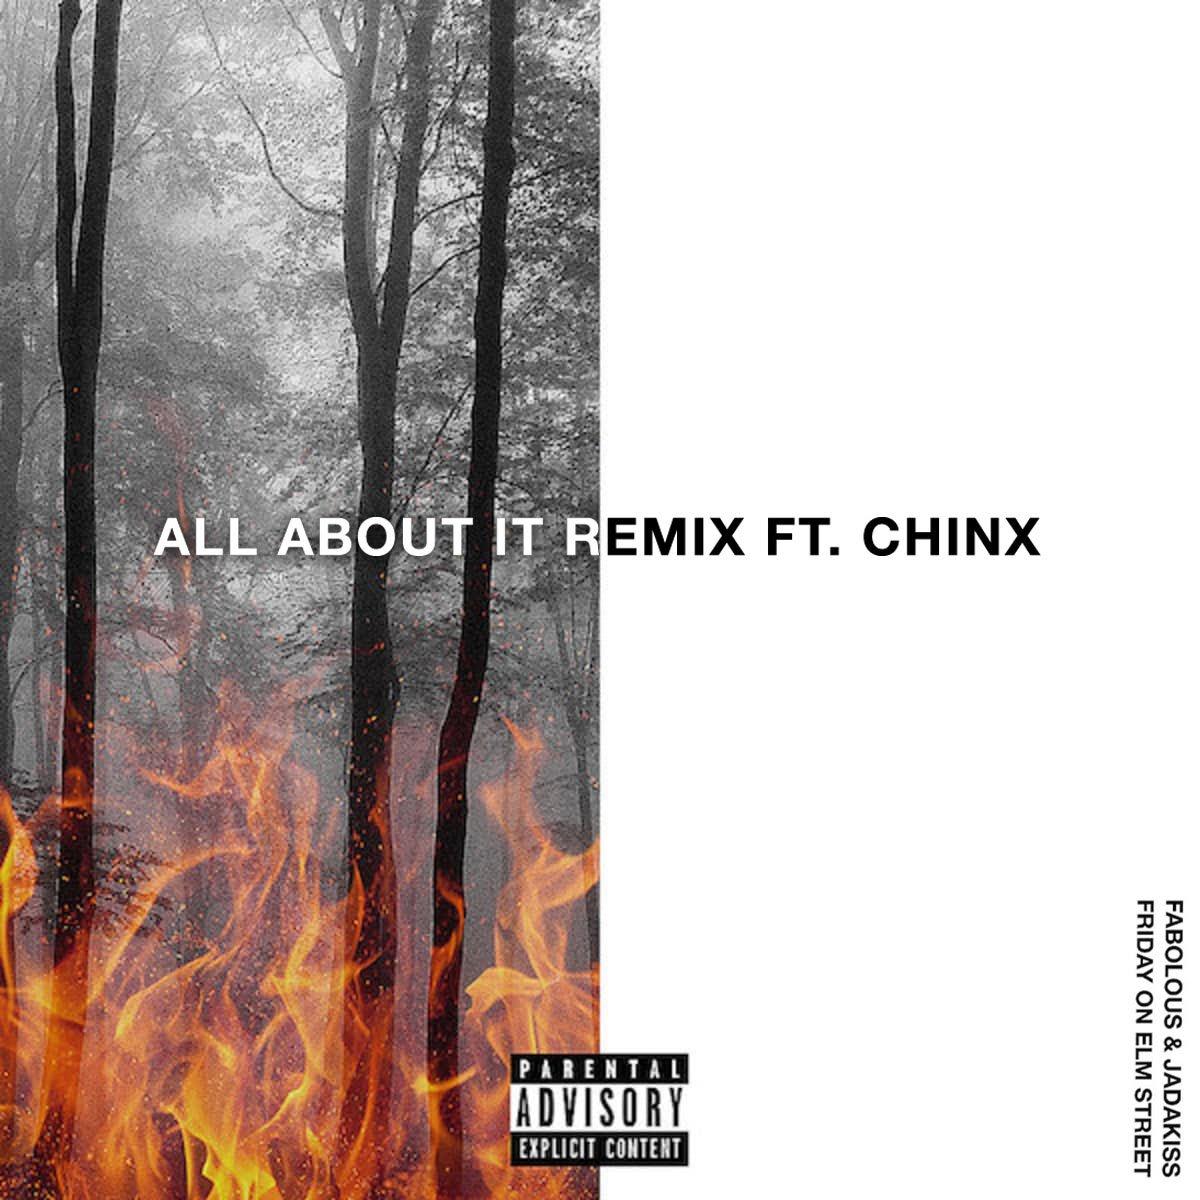 Fabolous & Jadakiss – All About It (Remix) (feat. French Montana & Chinx)